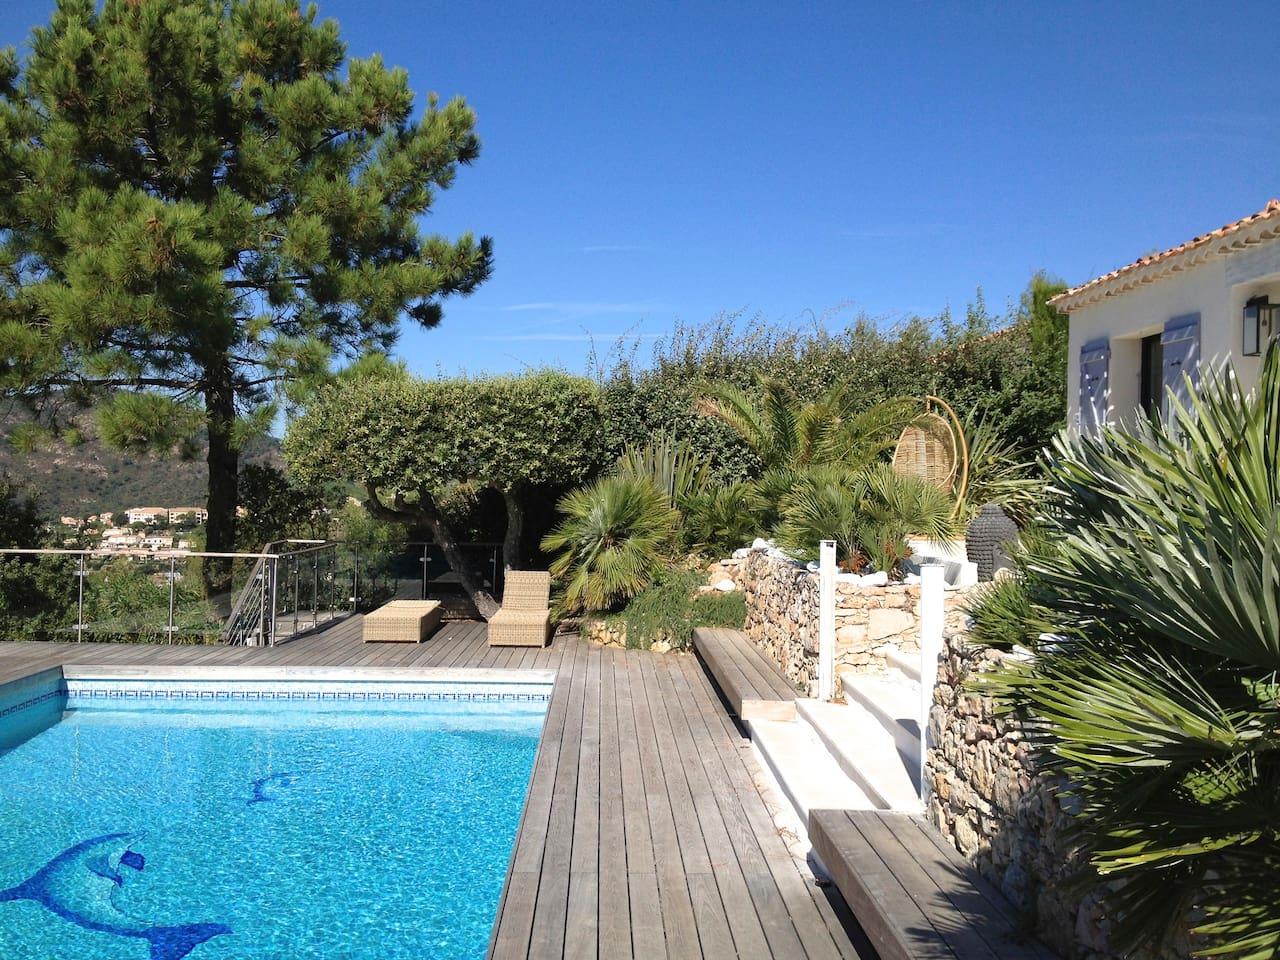 Villa 5*. Verwarmd zwembad. Jacuzzi. Sauna